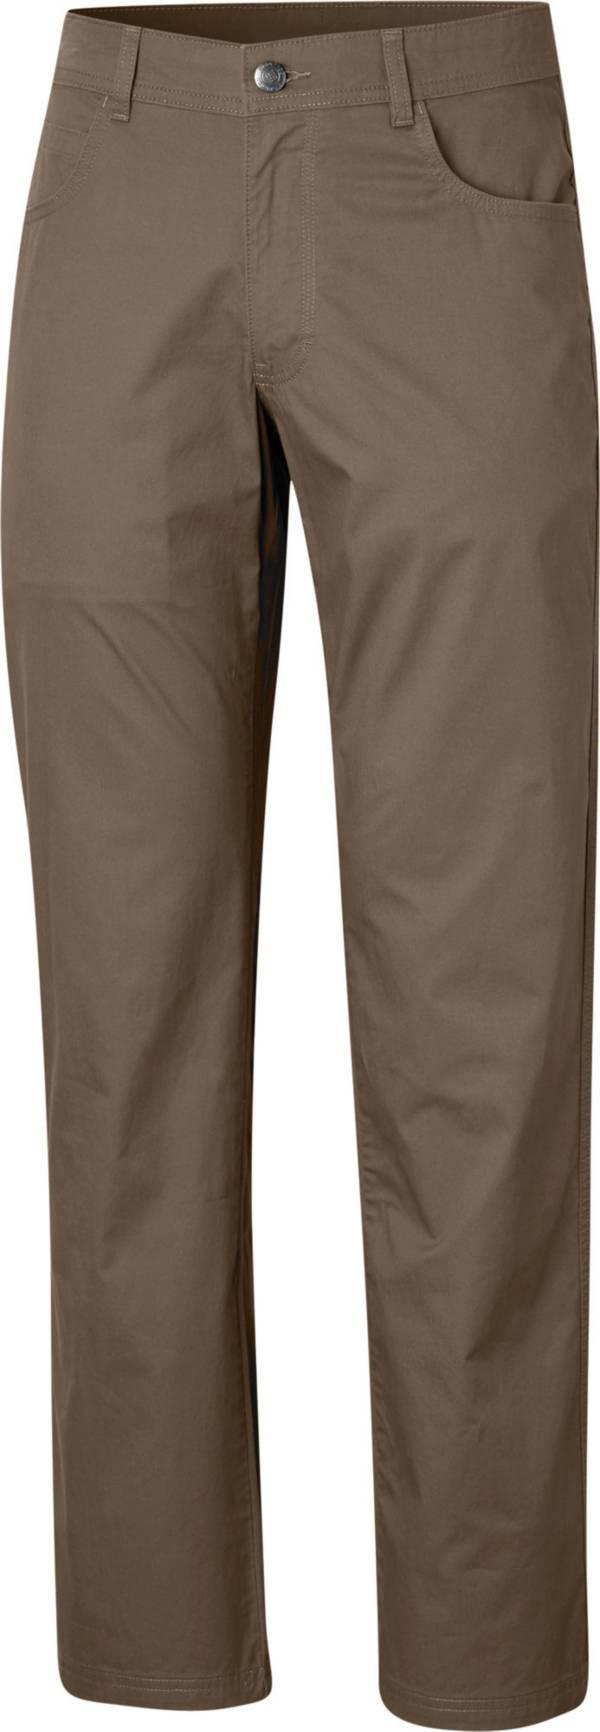 Columbia Men's Rapid Rivers Pant product image